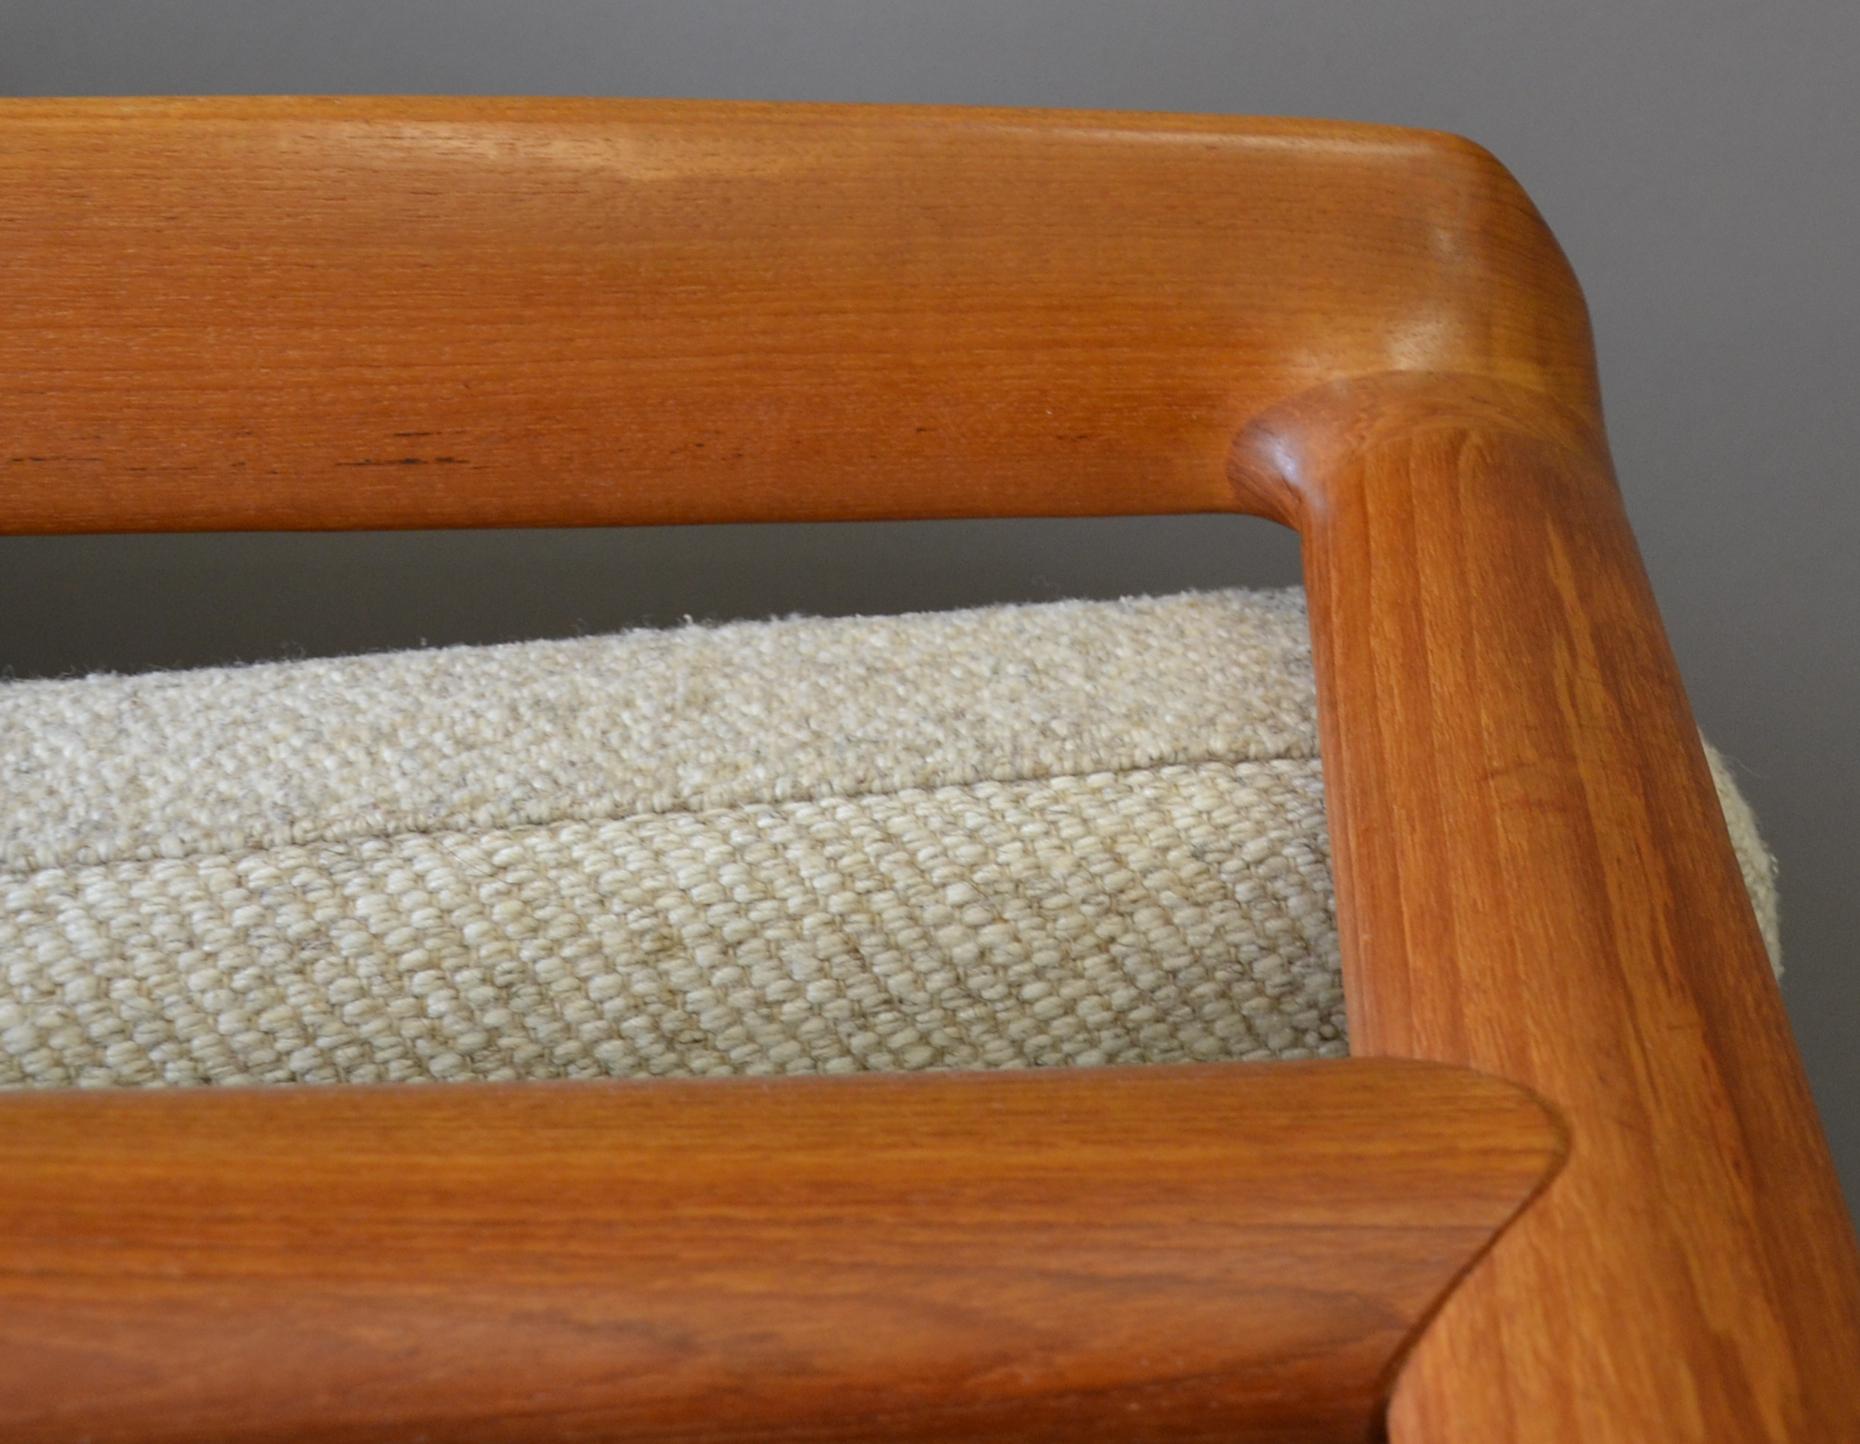 bilder zu 317286 sitzgruppe komfort m bel d nemark auctionet. Black Bedroom Furniture Sets. Home Design Ideas